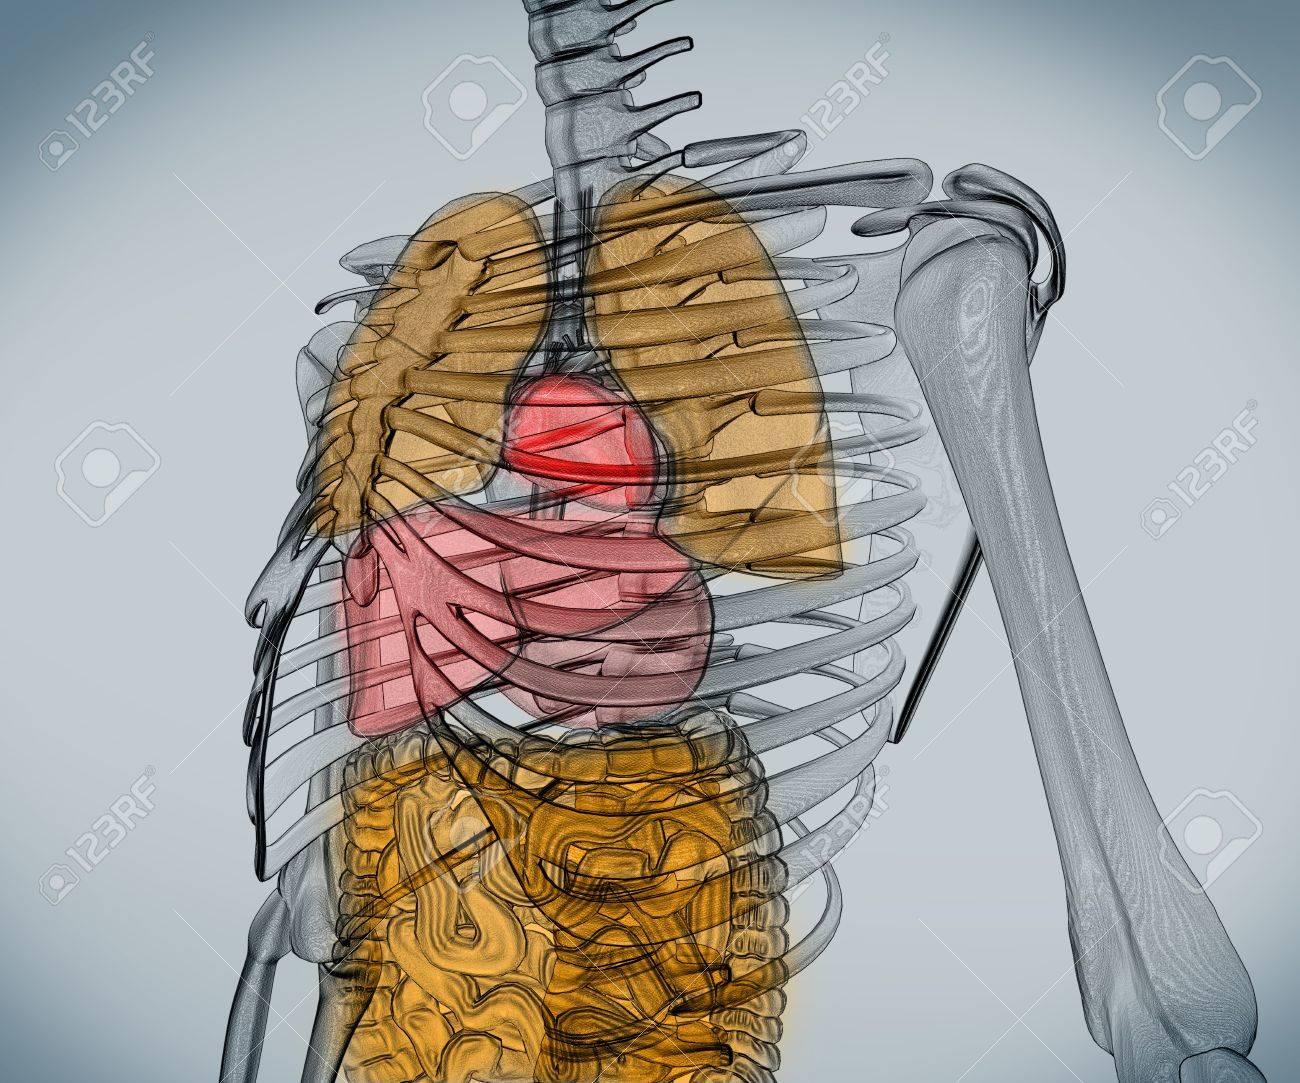 Digital skeleton with visible internal organs Stock Photo - 18116325